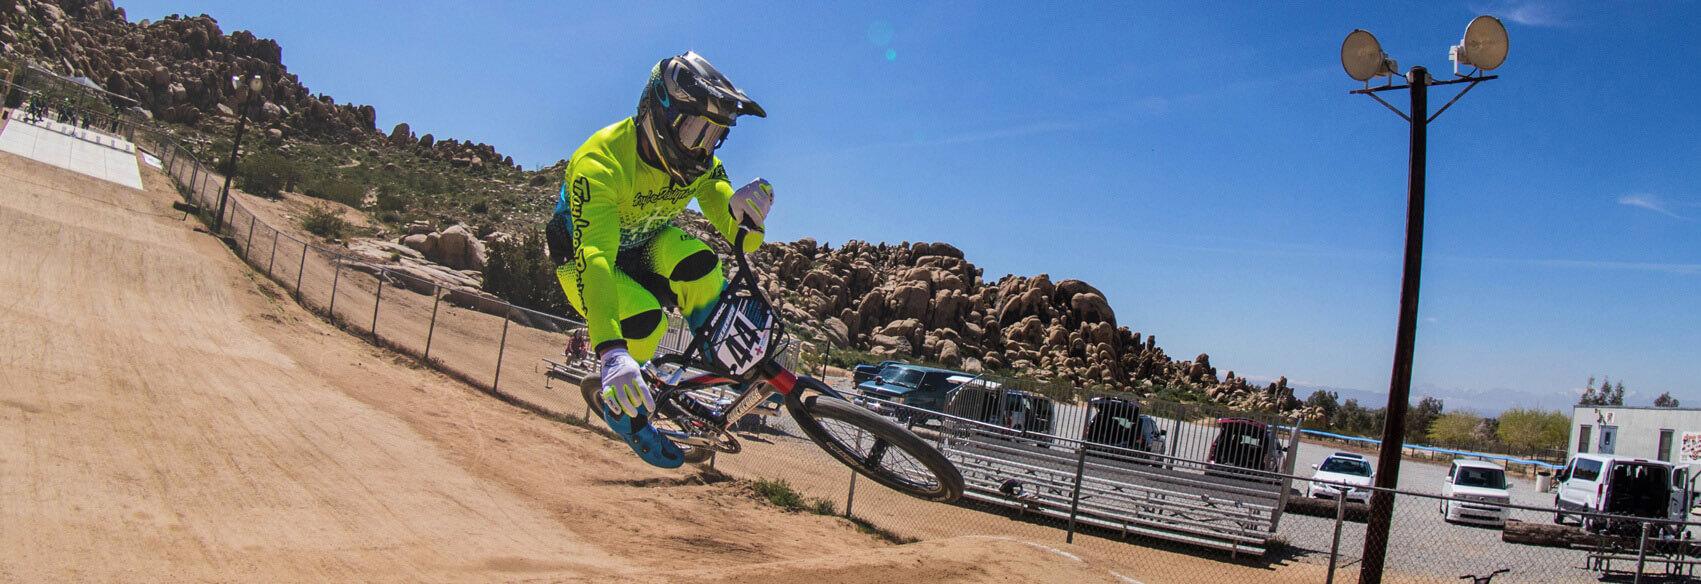 Anthony Dean - Supercross BMX - Korban Corbett